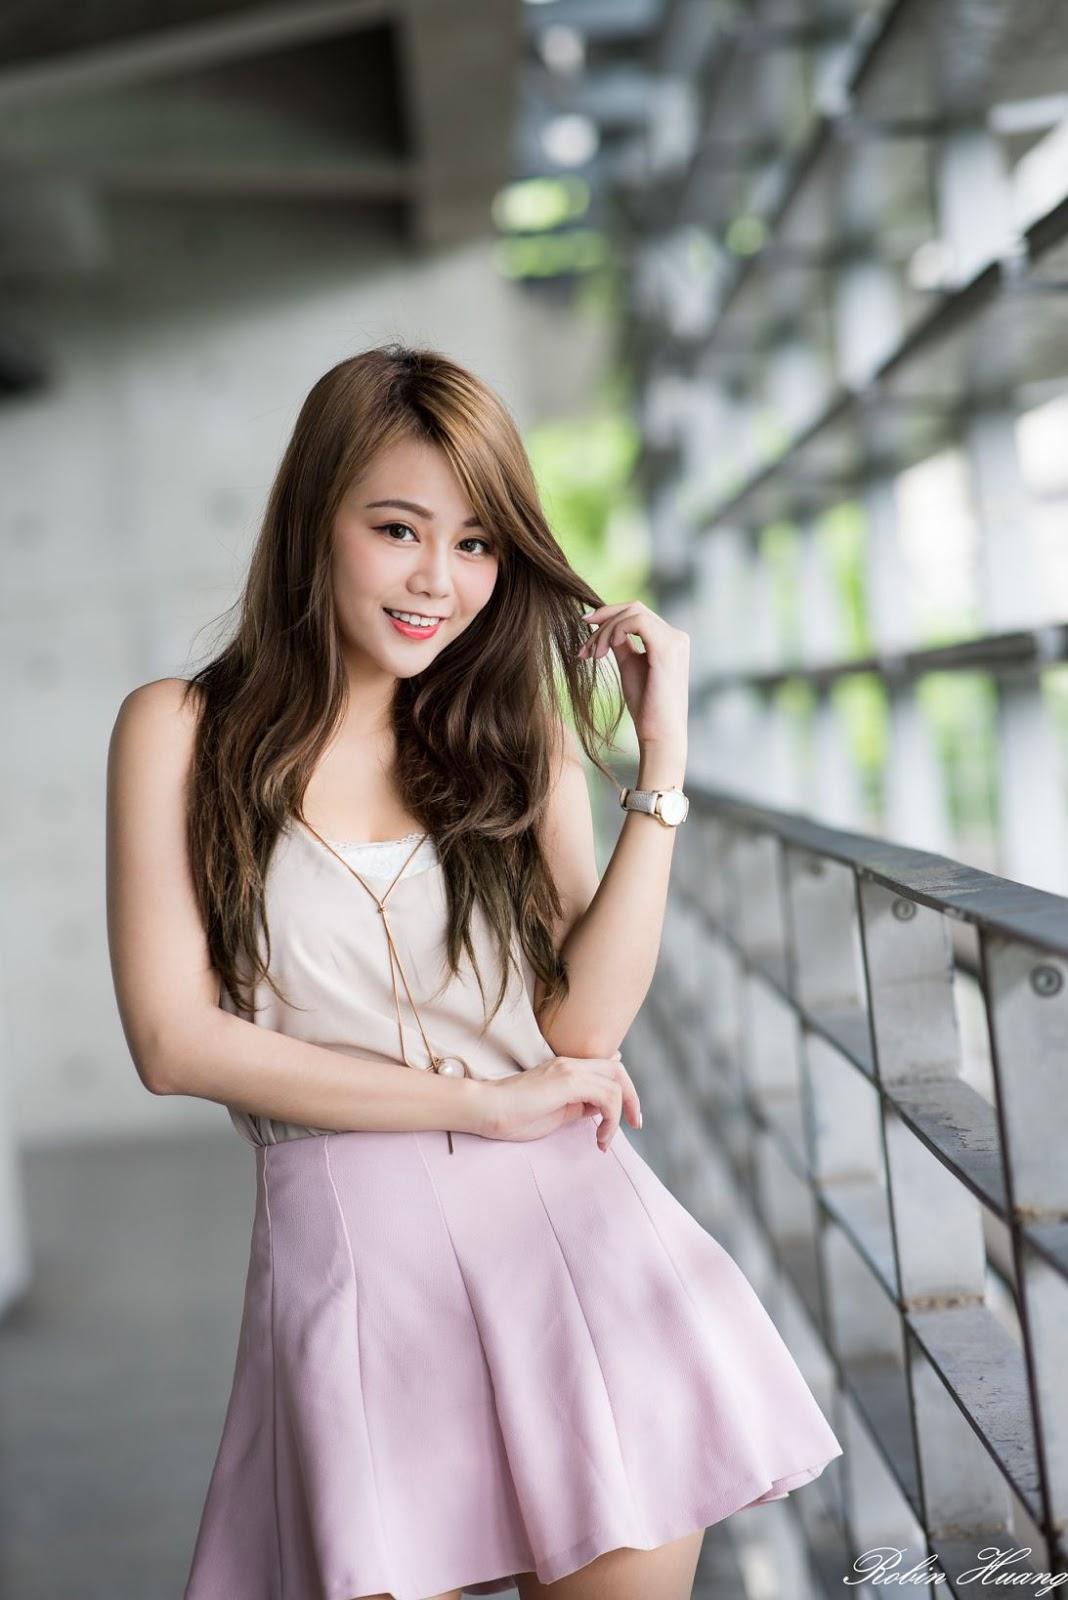 Sun Hui Tong - 孫卉彤 - 2017.10.08 - Practice University - TruePic.net